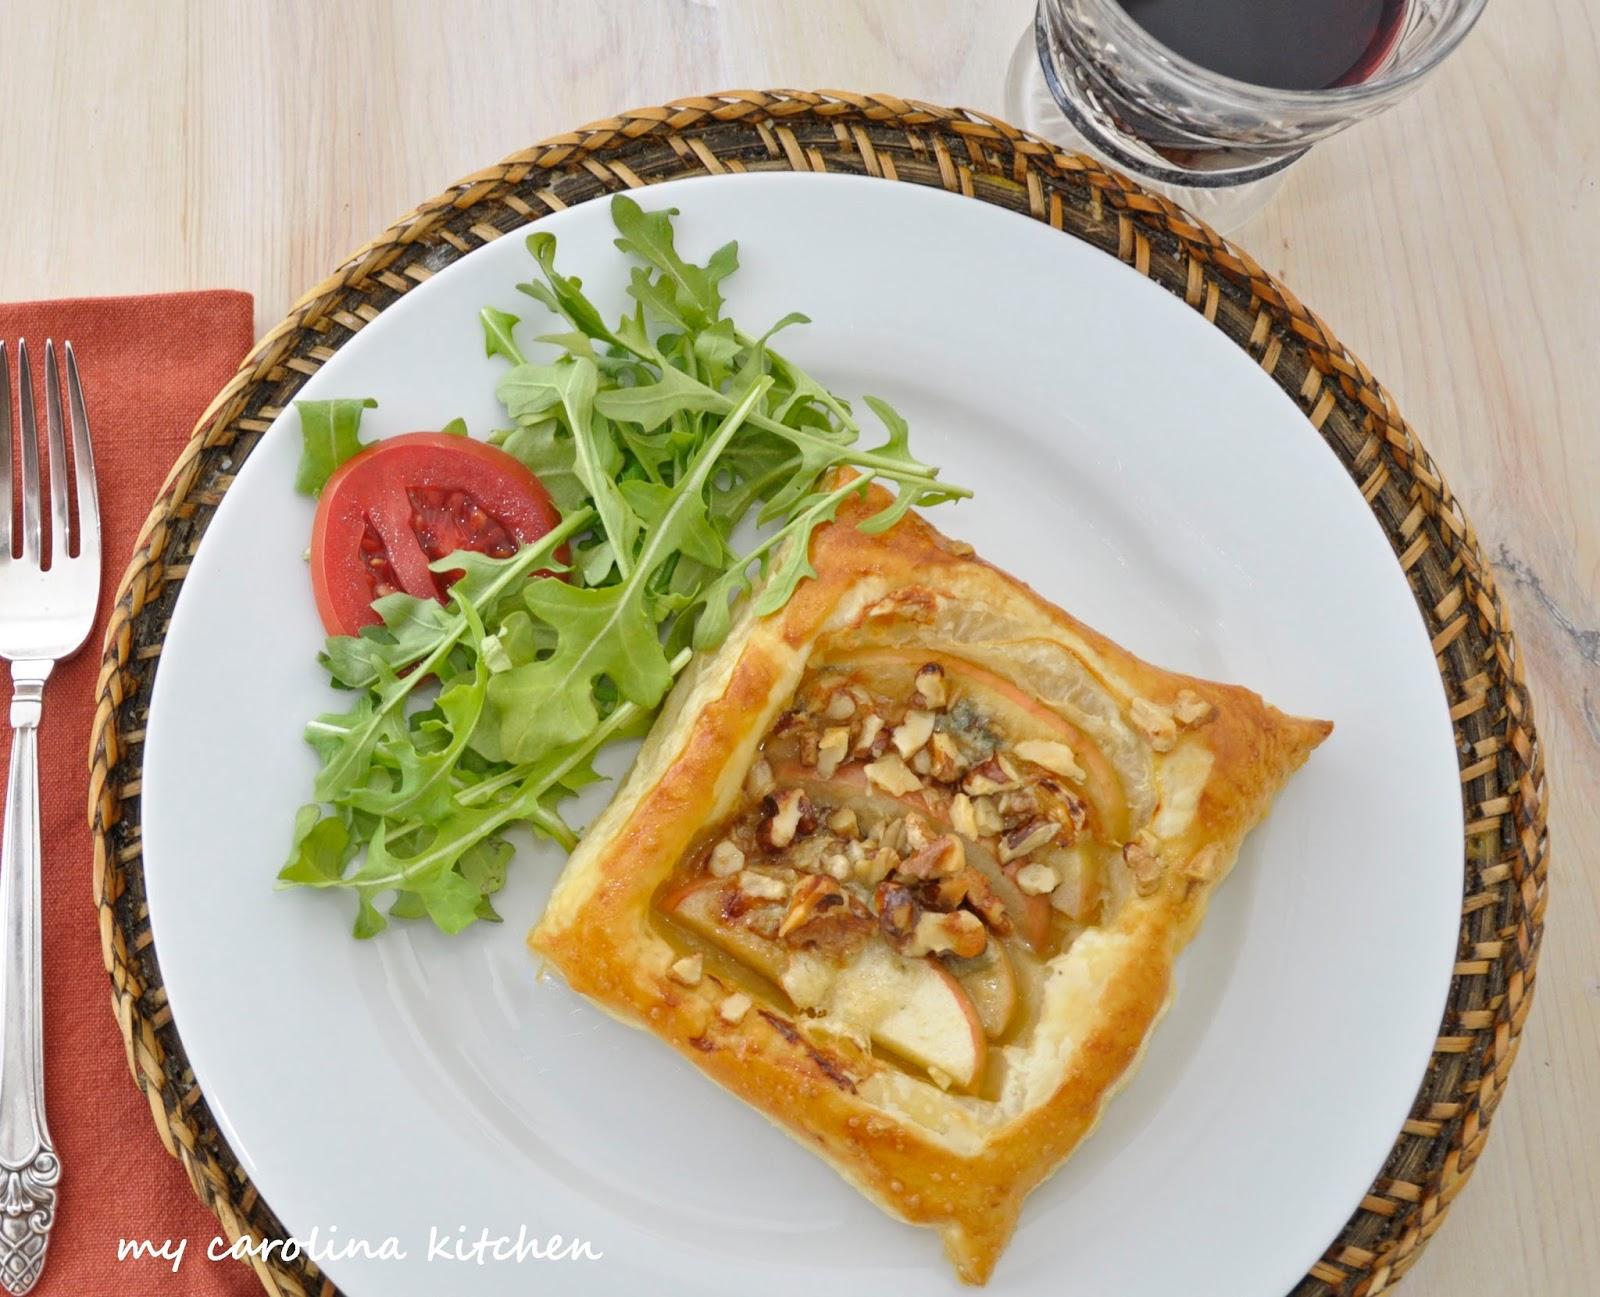 My Carolina Kitchen: Individual Savory Apple, Blue Cheese & Walnut Tarts